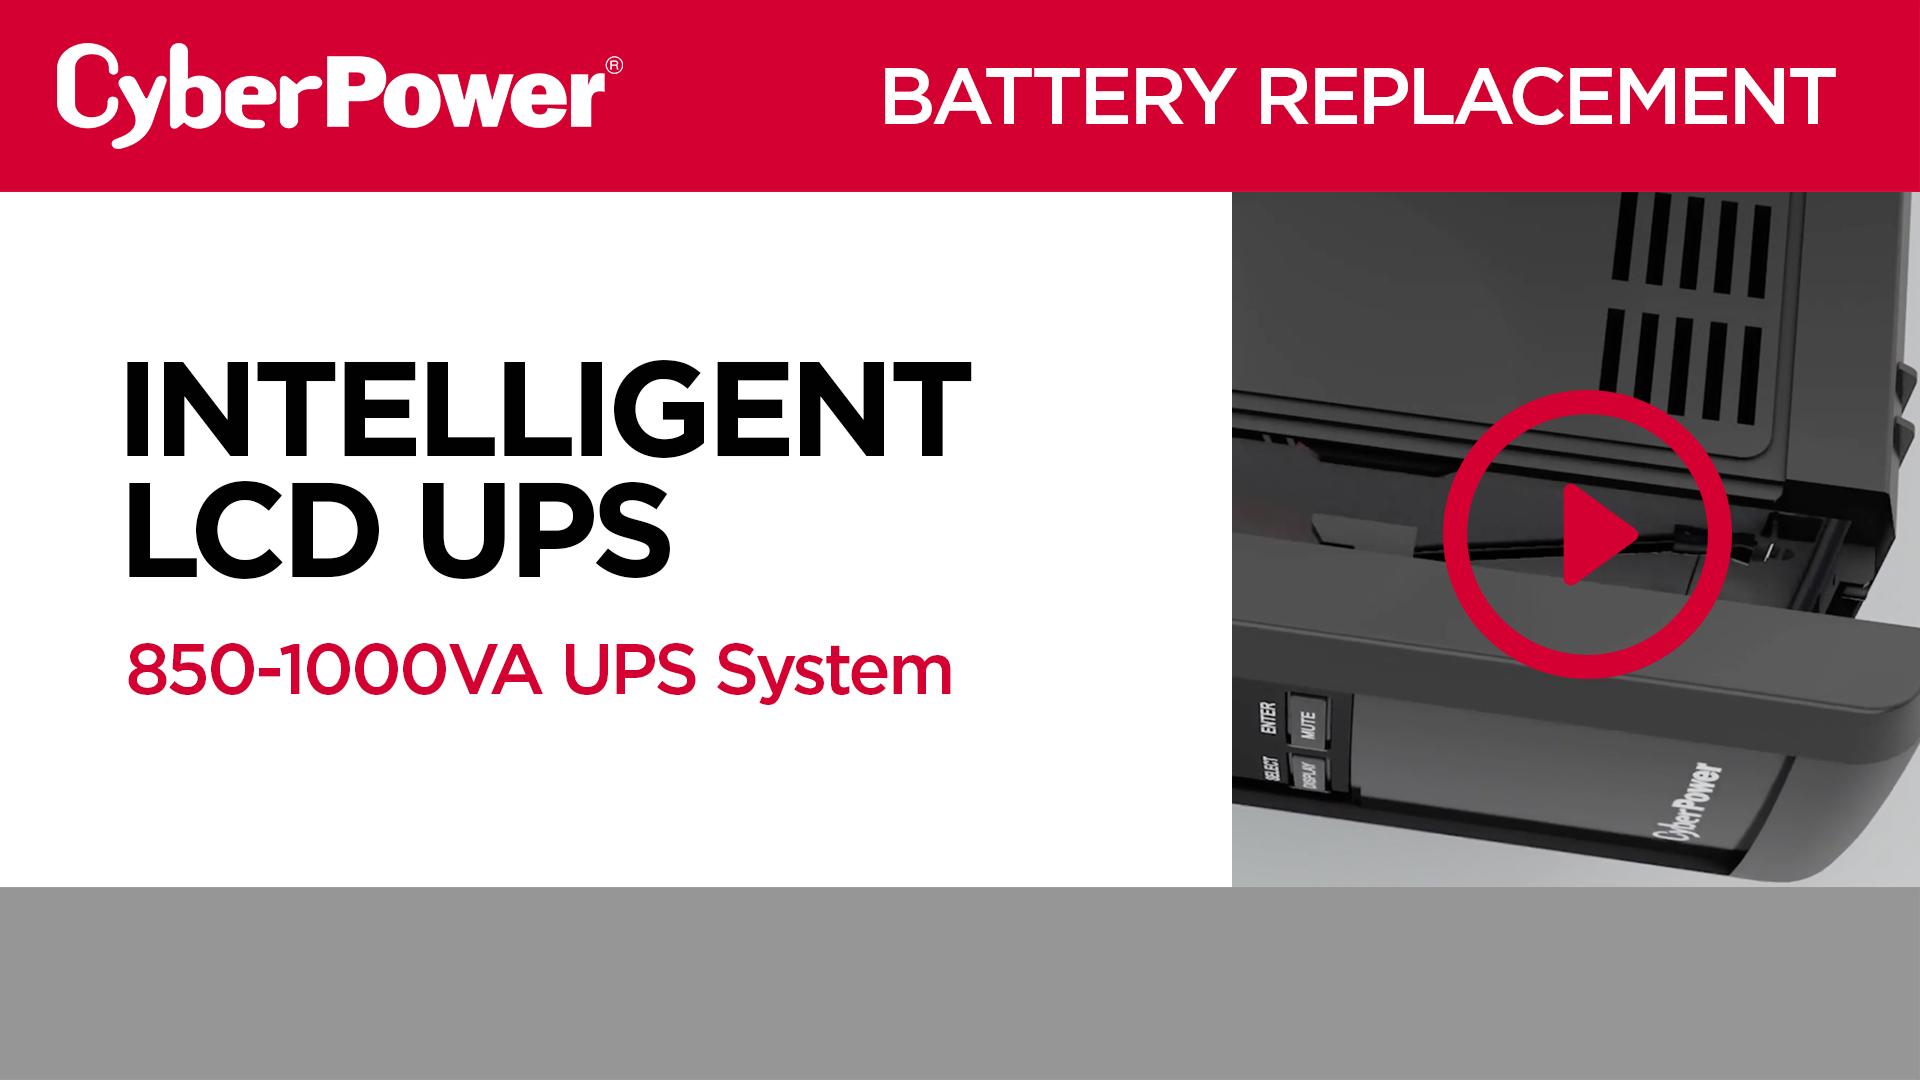 Intelligent LCD 850-1000VA Replacement Battery